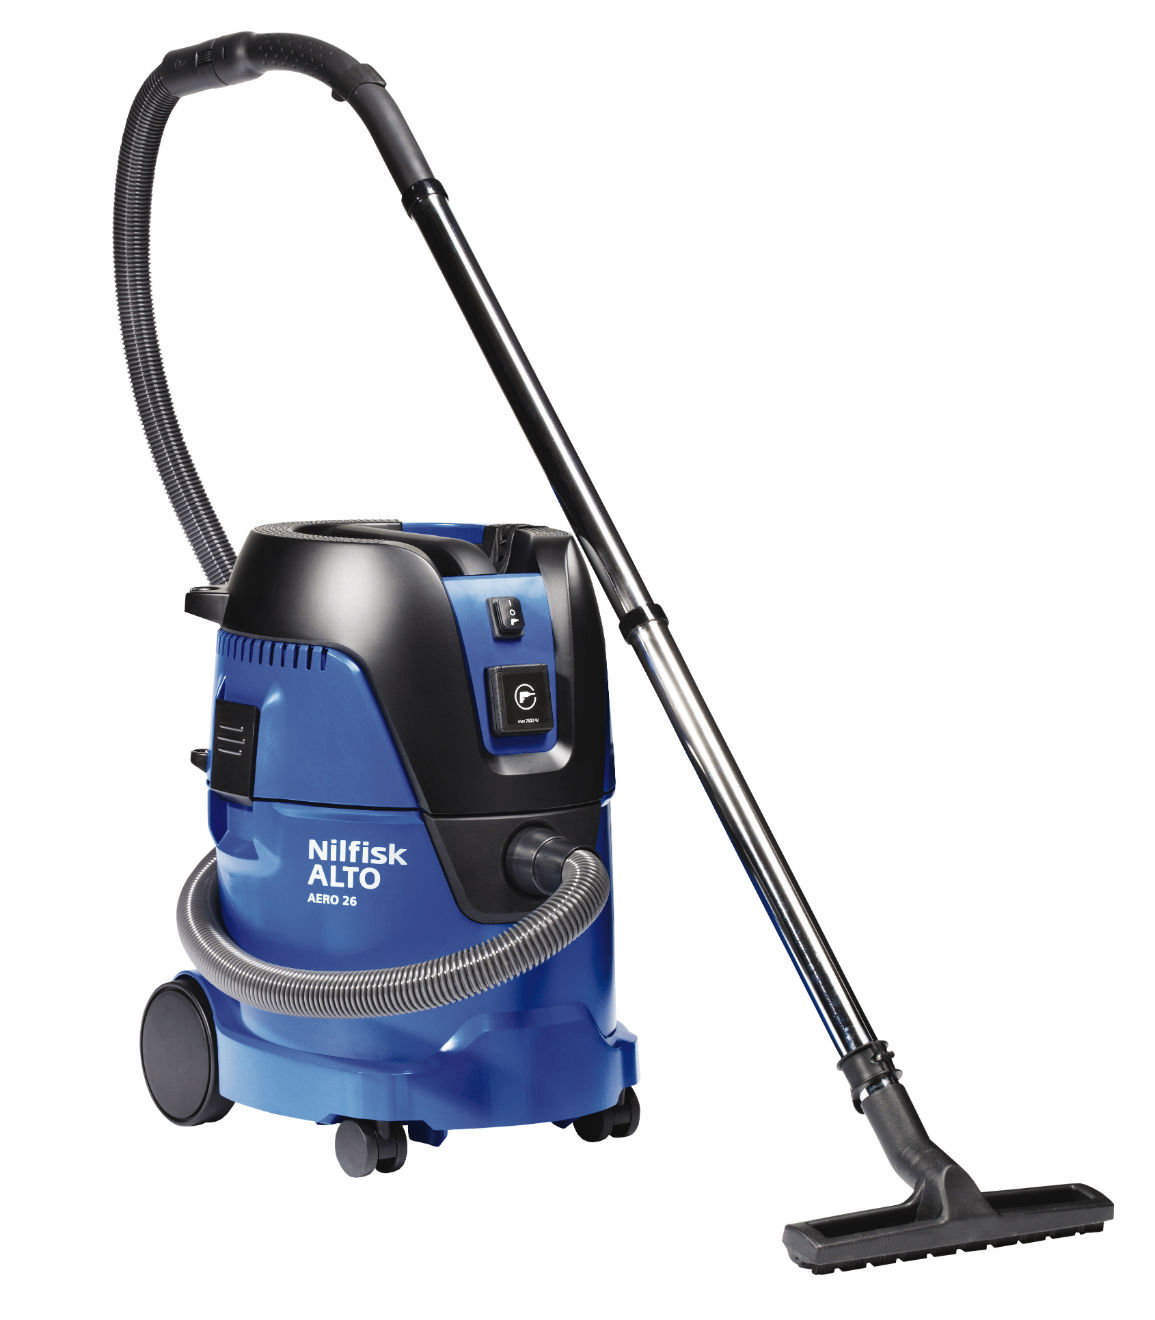 nilfisk alto aero 26 21 pc 240v 110v vacuum cleaner. Black Bedroom Furniture Sets. Home Design Ideas